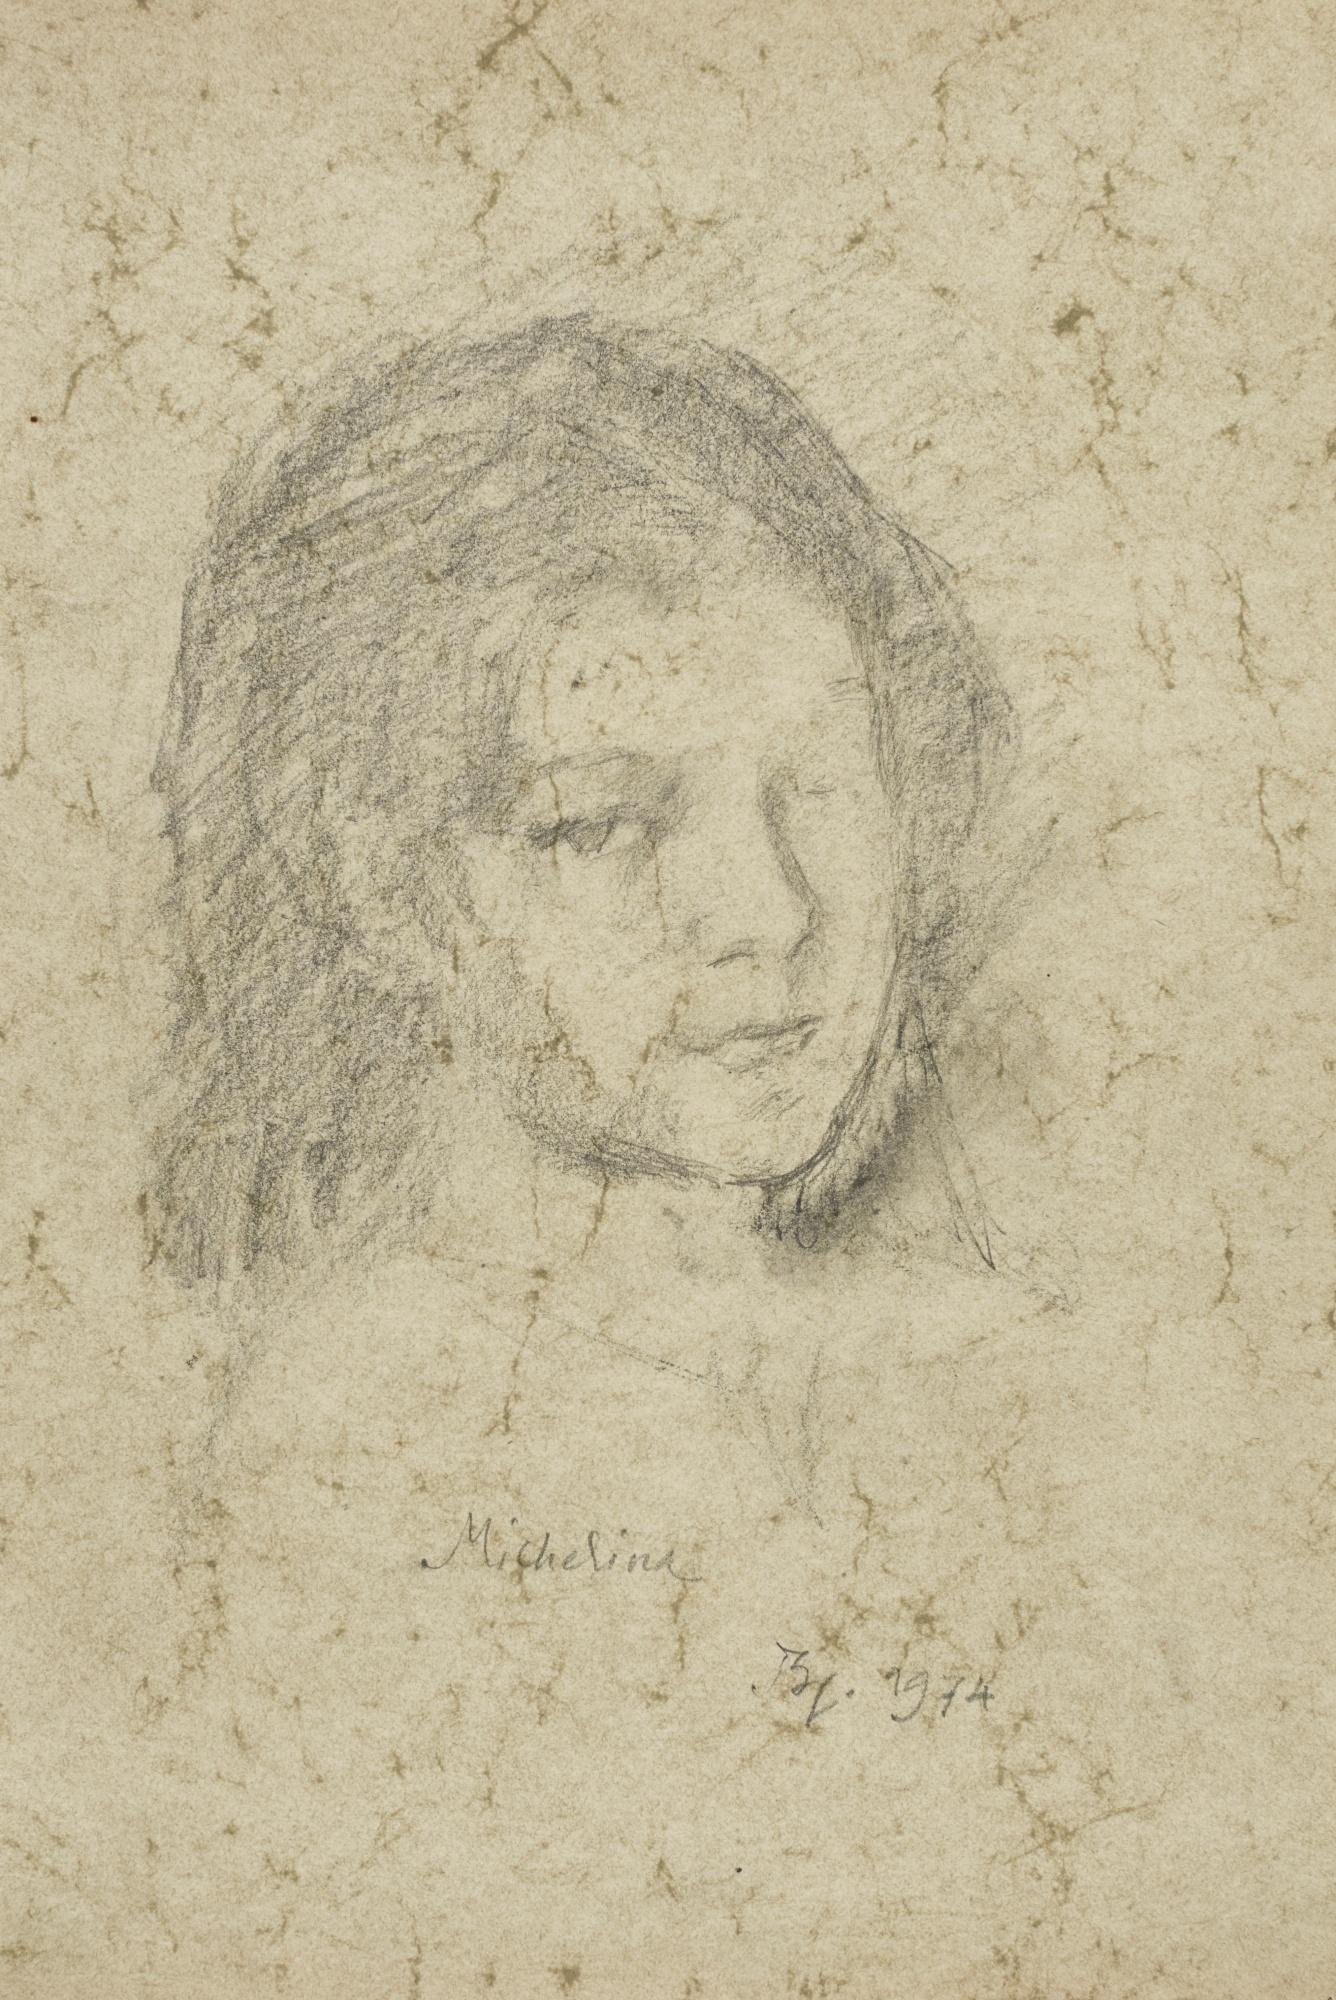 Balthus-Portrait De Michelina-1974